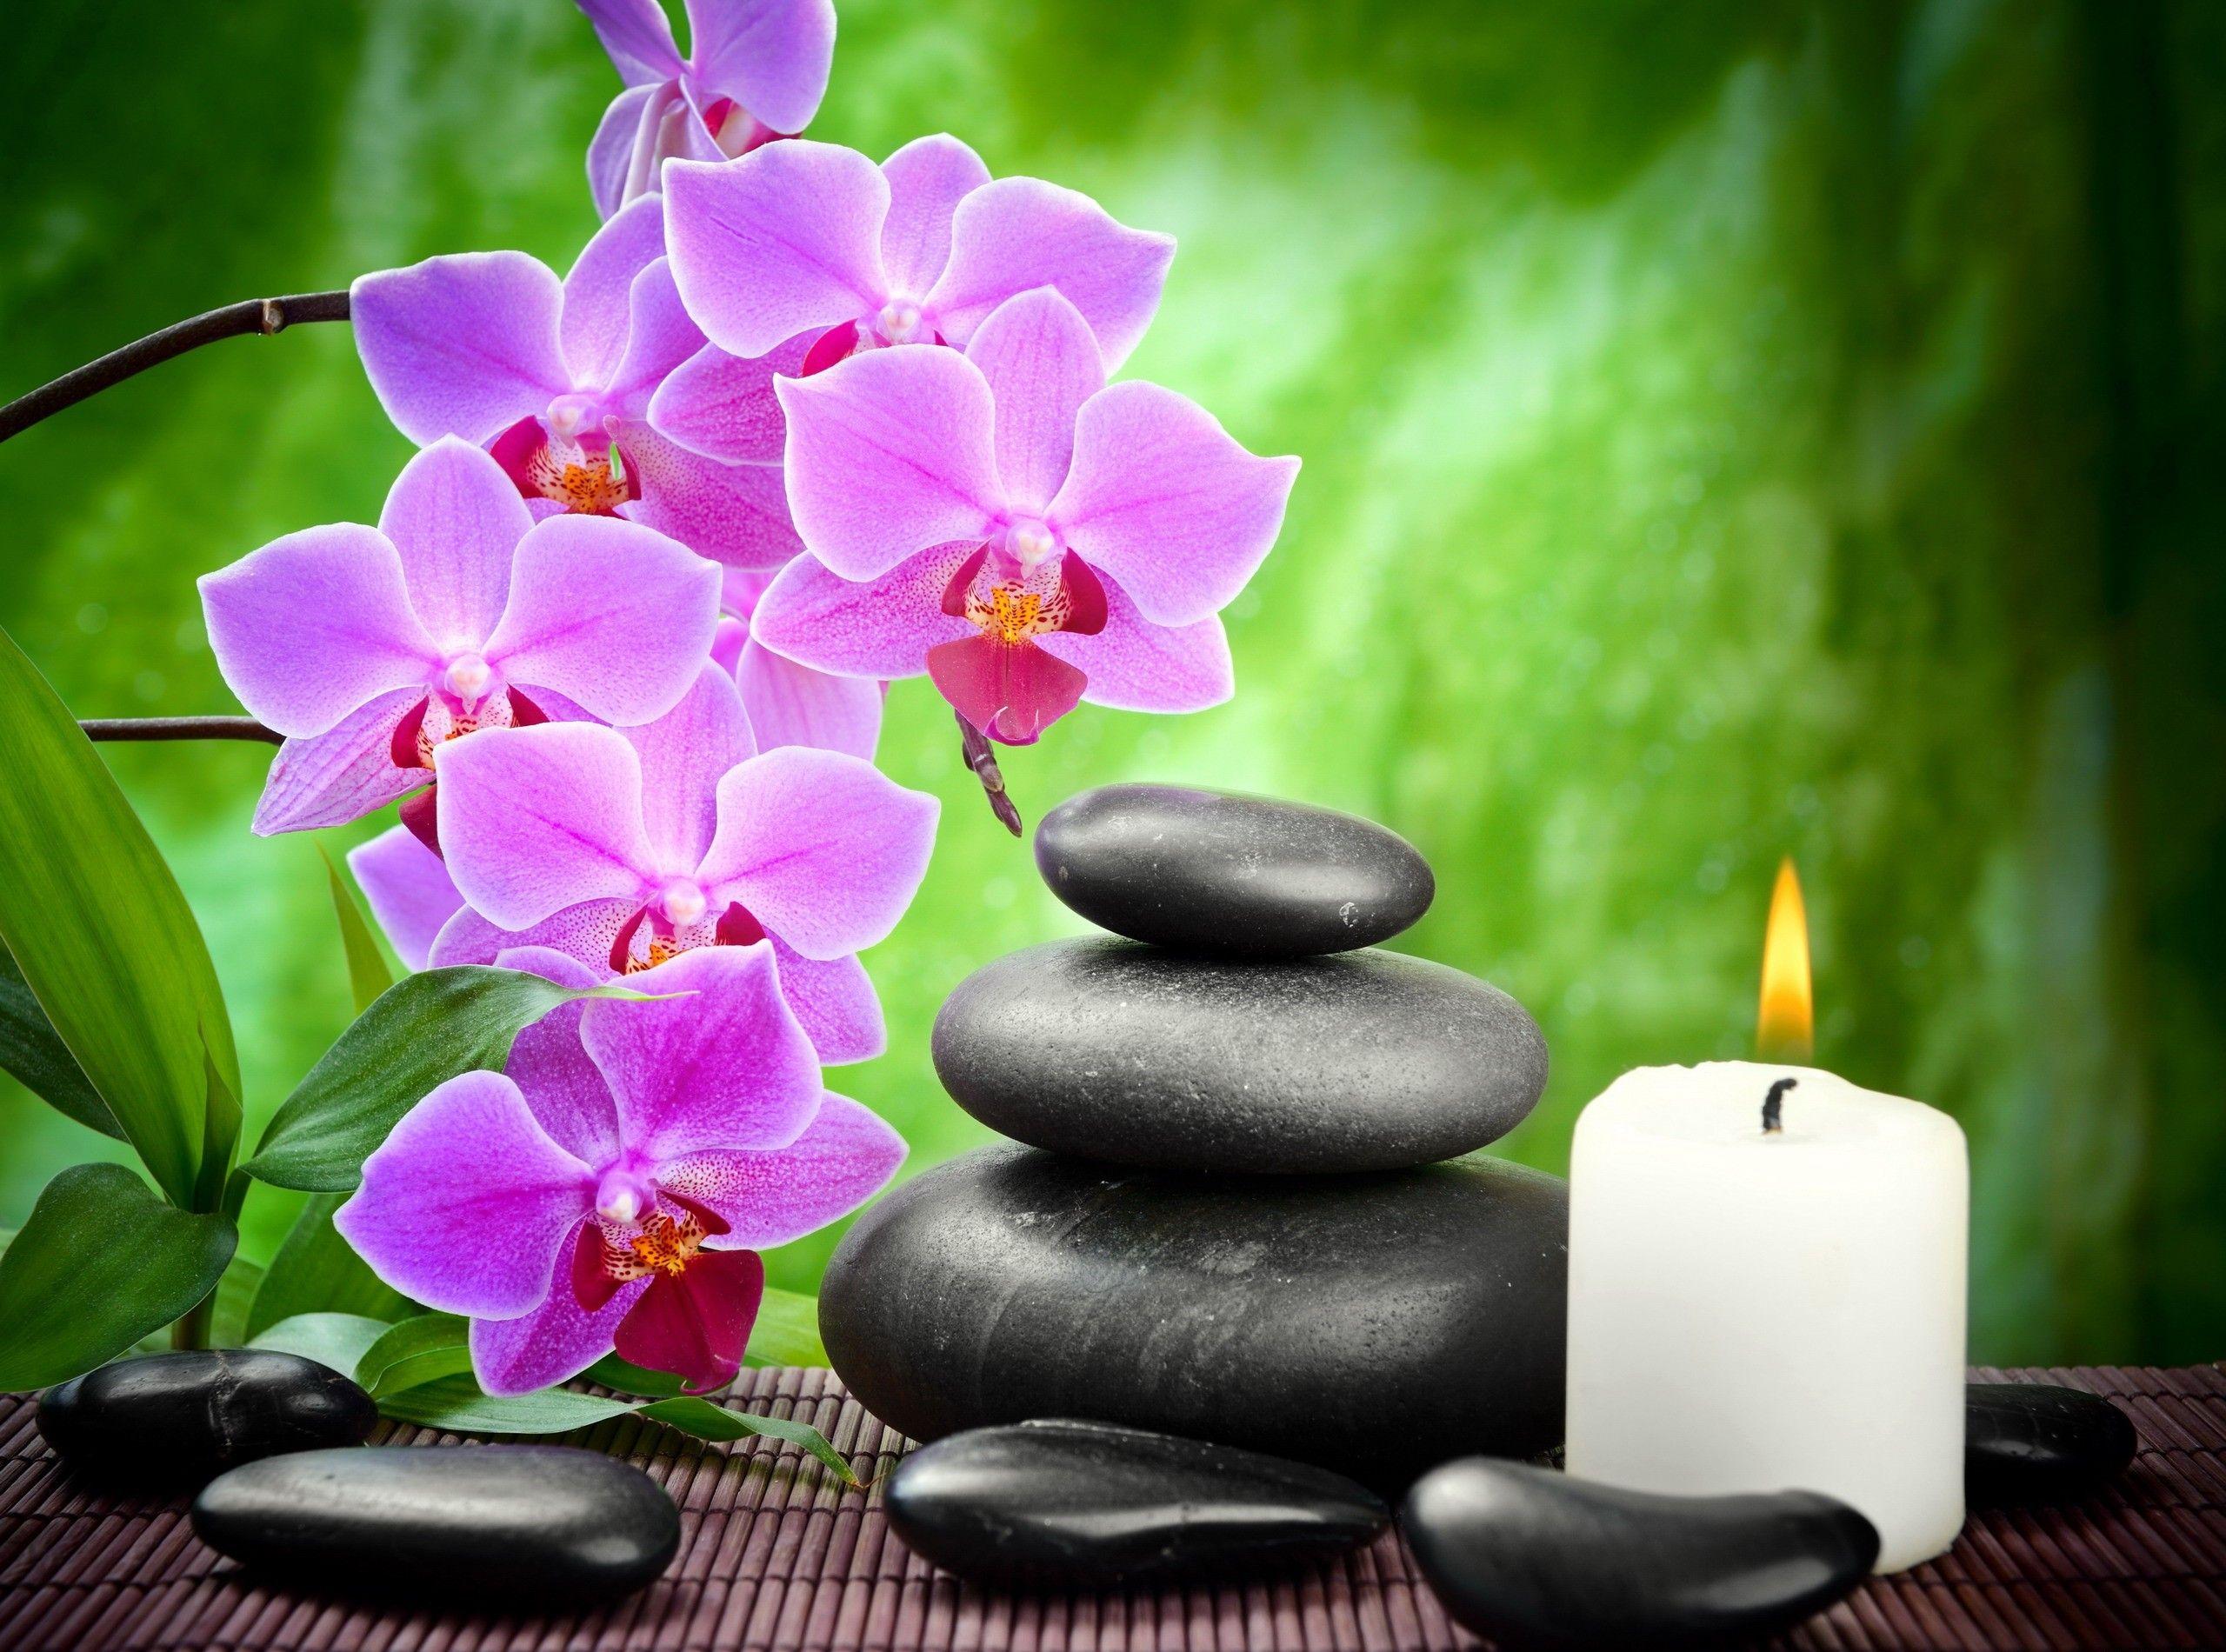 fond d'ecran zen orchidee